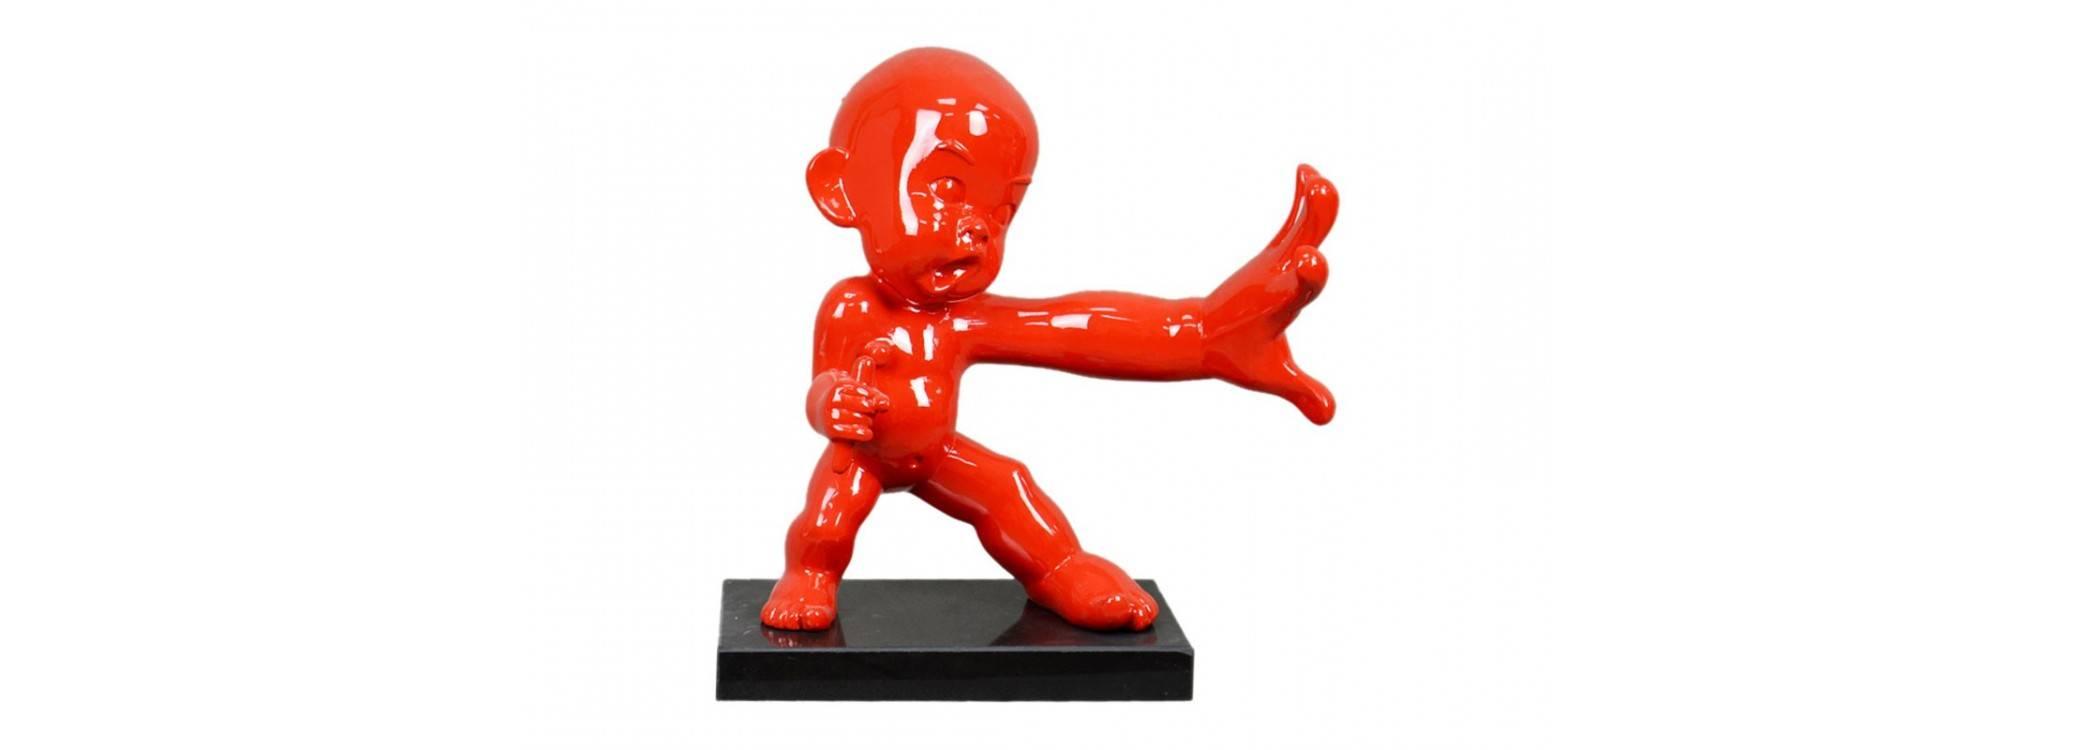 Ninja baby statue in resin